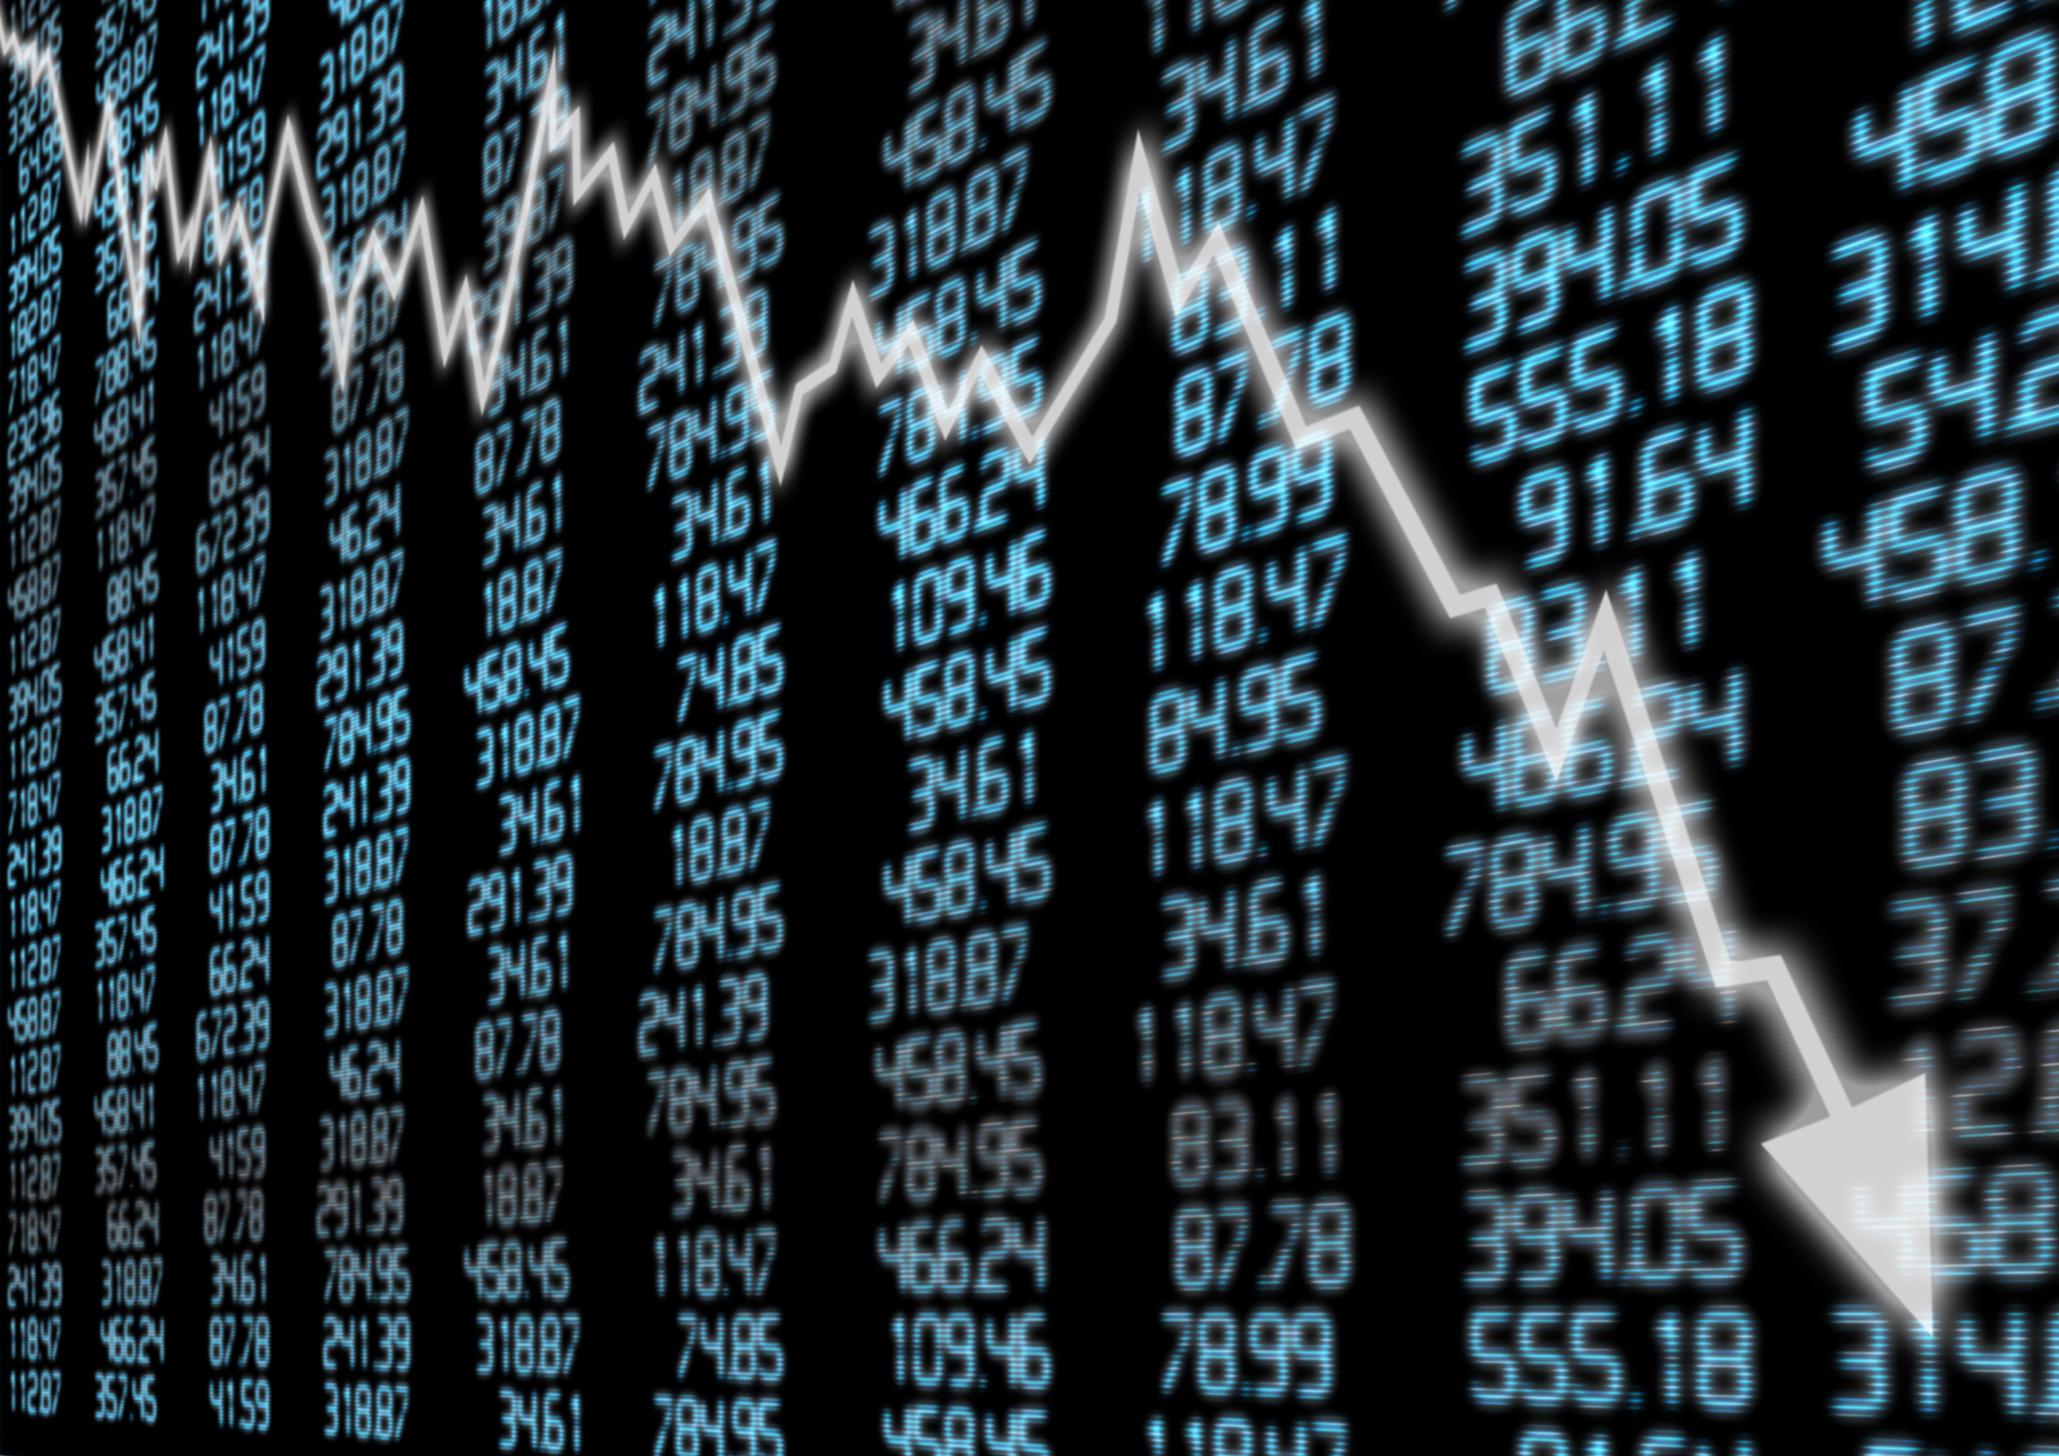 Downward trend arrow over stock symbols